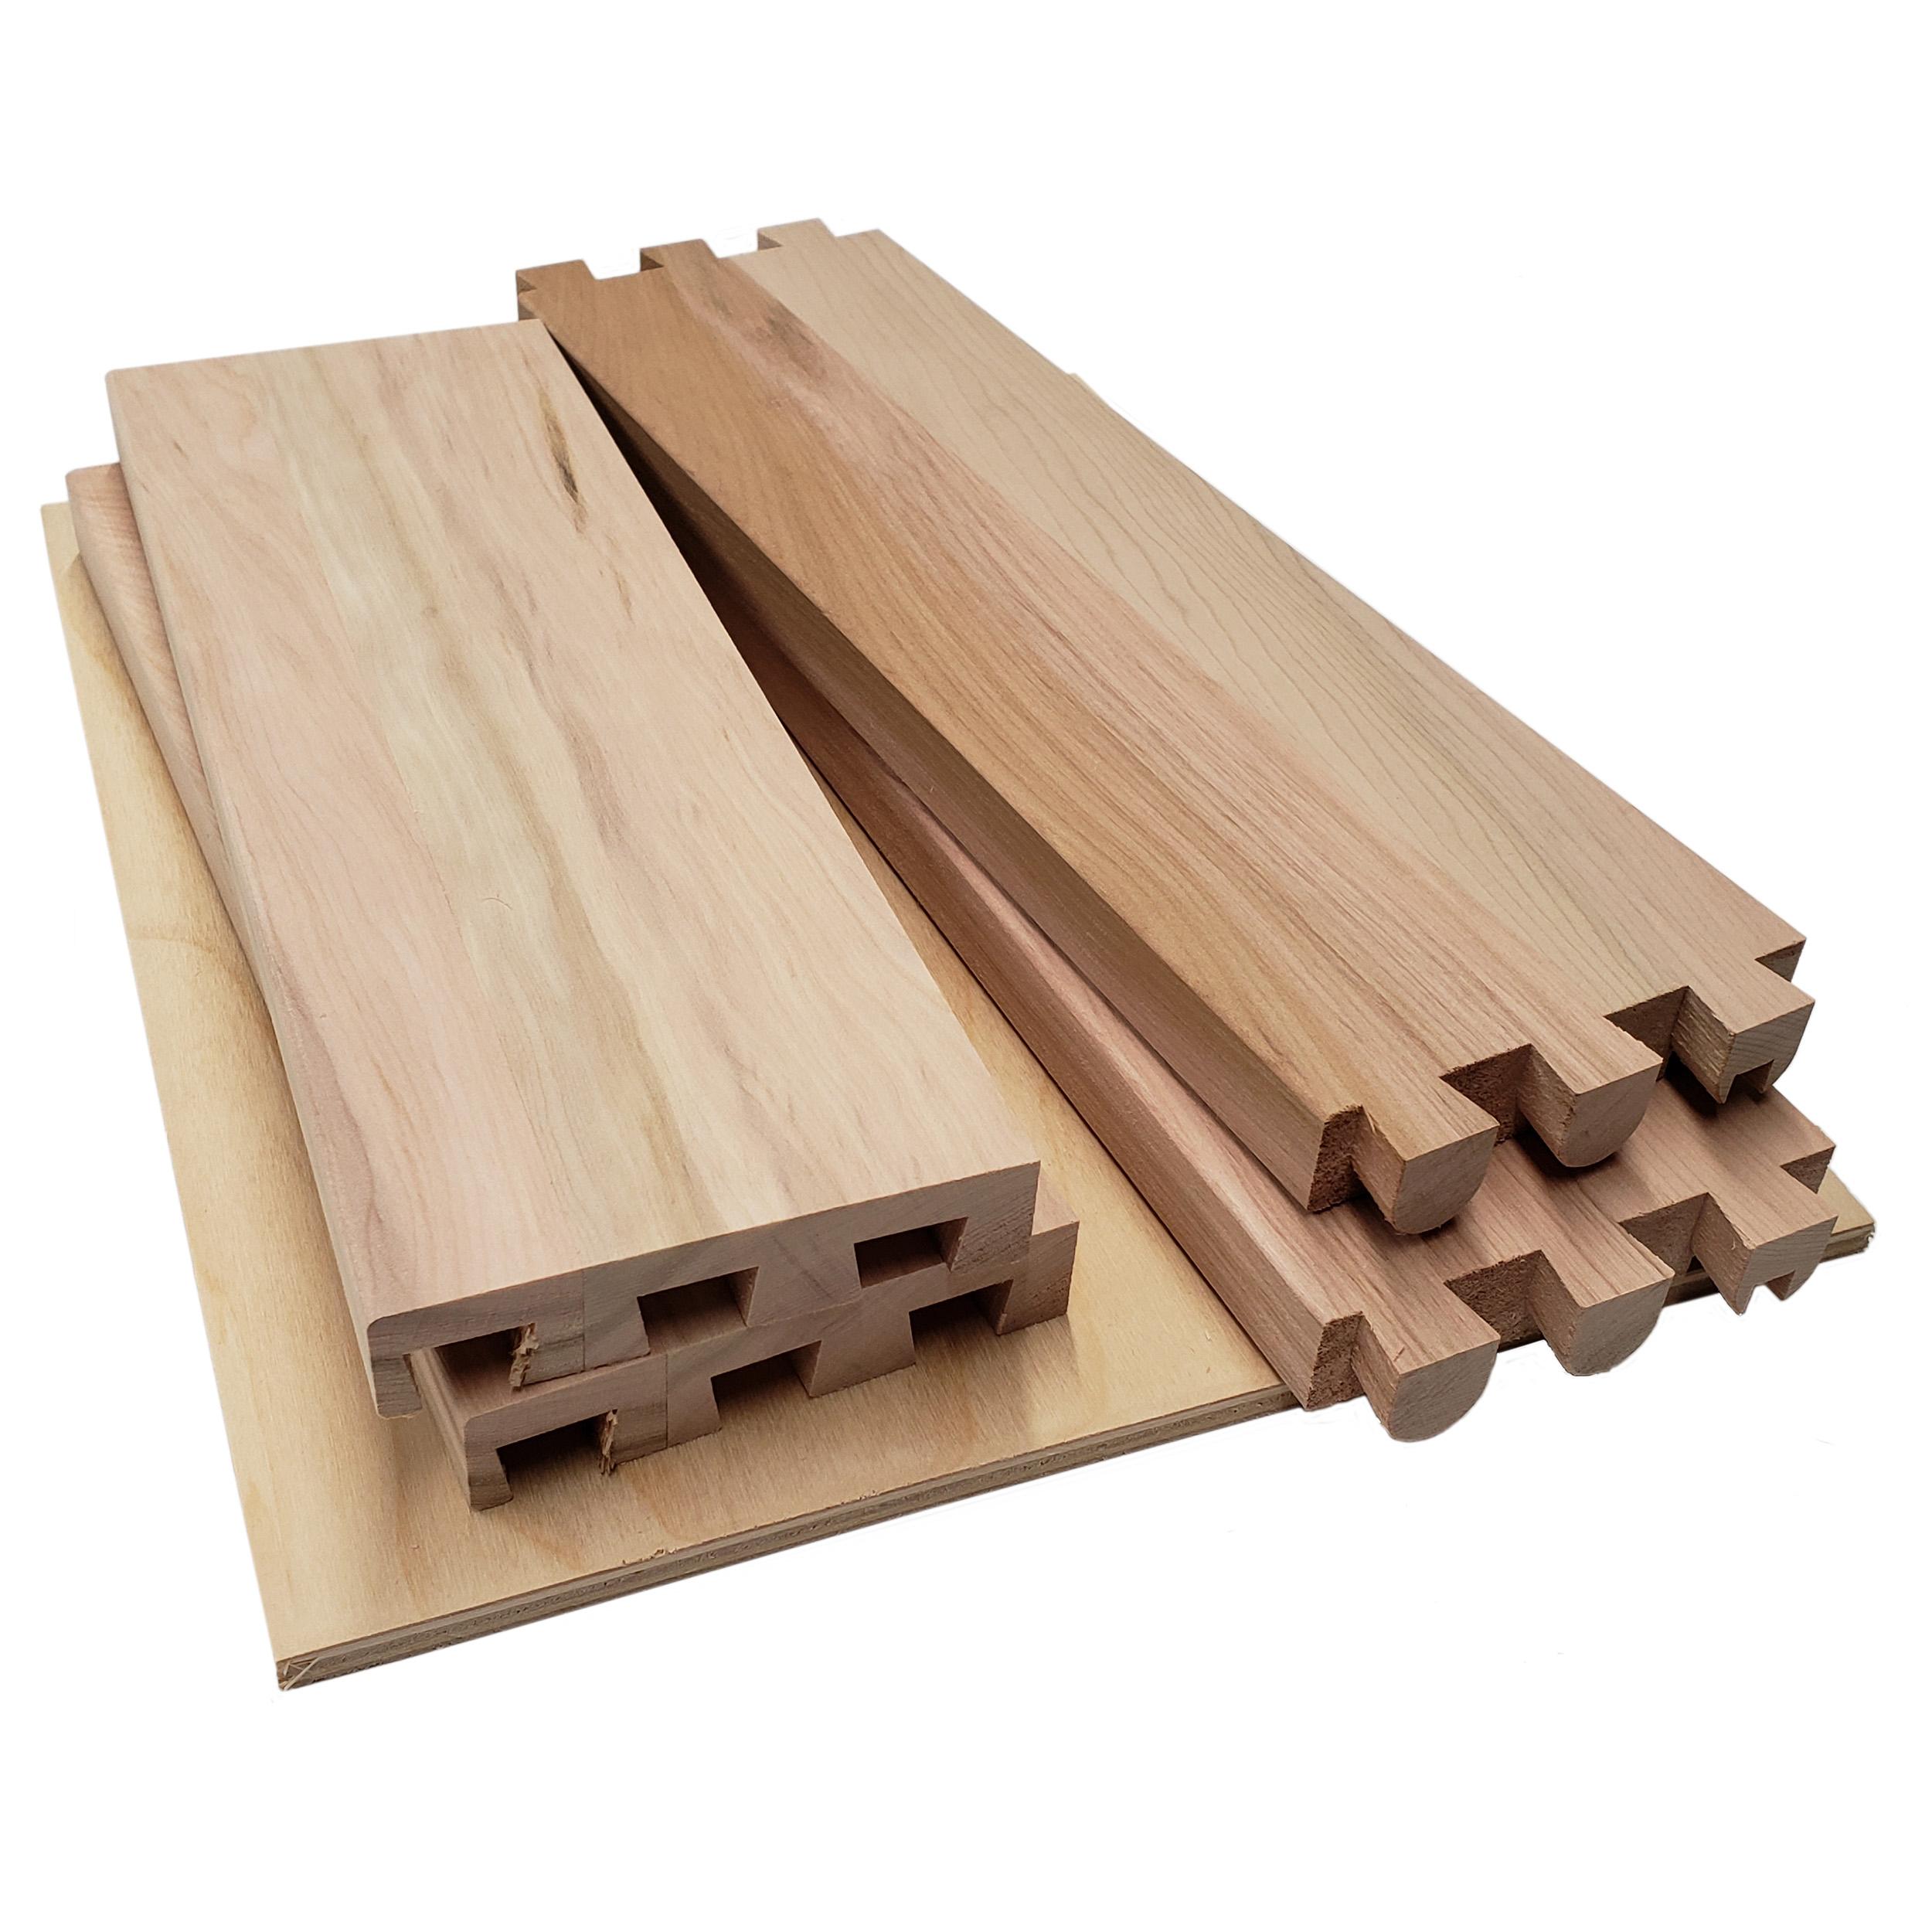 Dovetail Drawer Boxes - 4.125